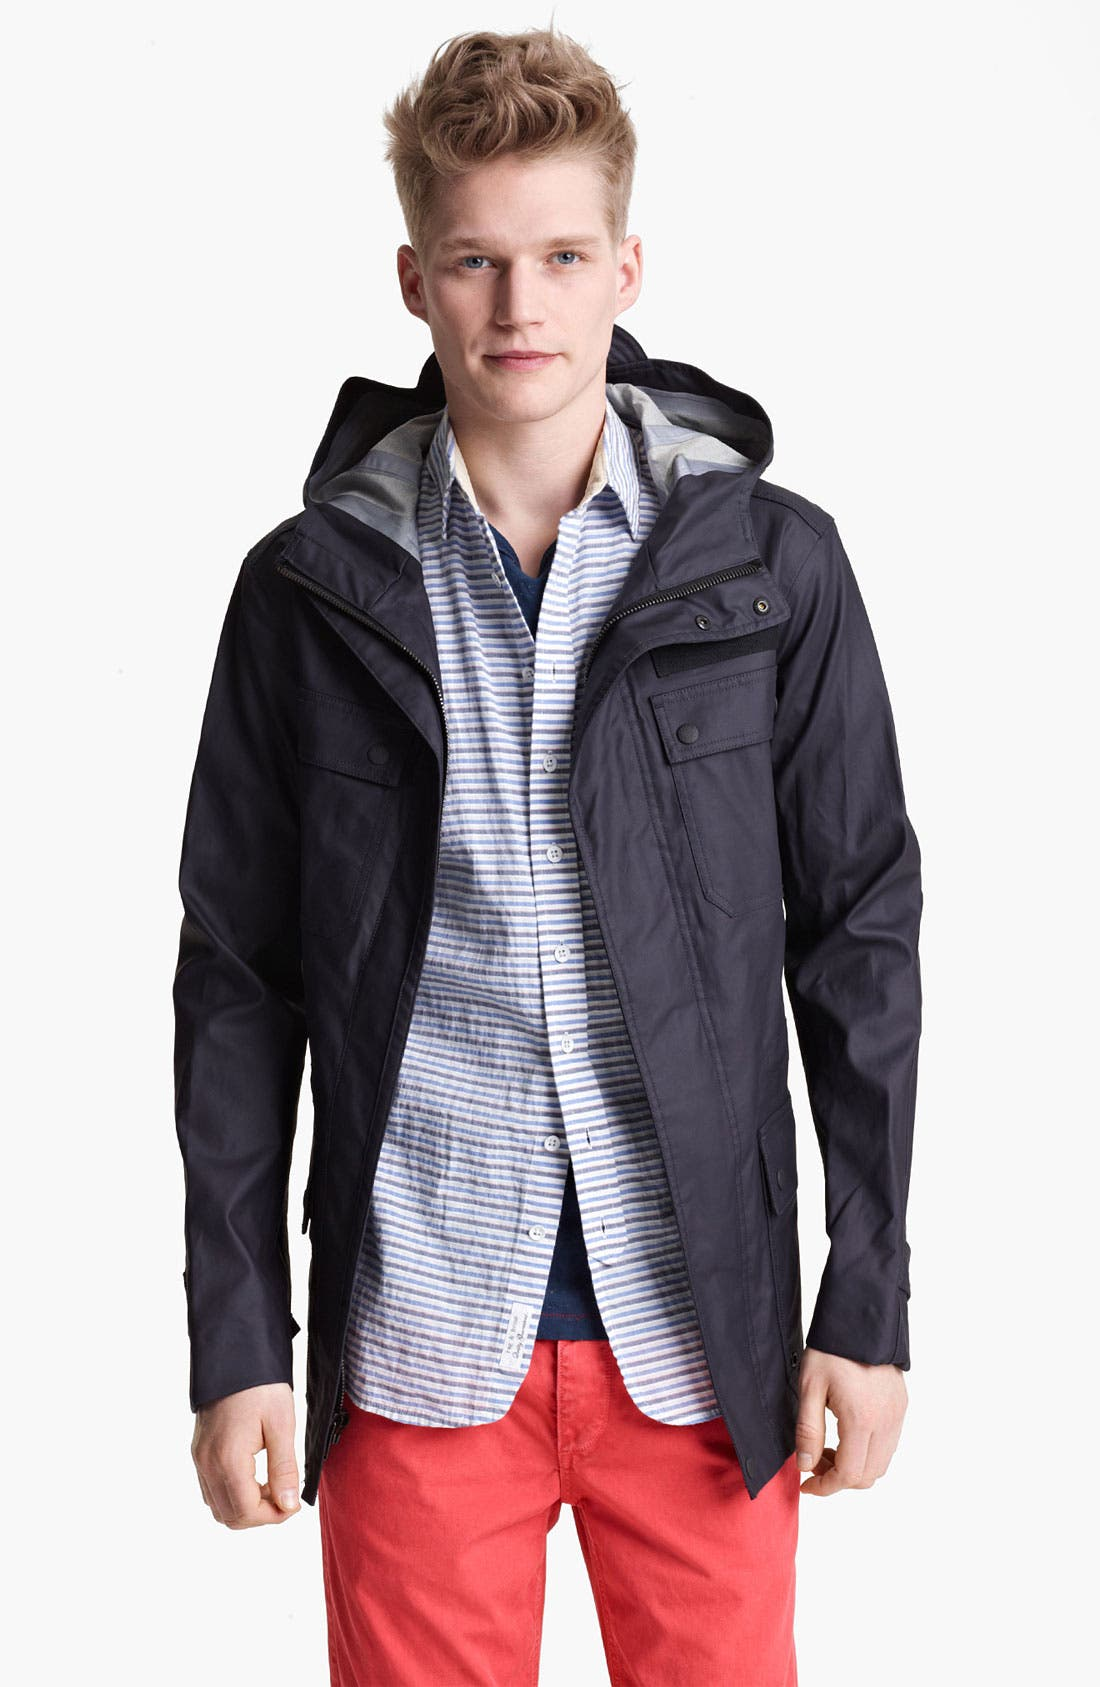 Alternate Image 1 Selected - rag & bone 'Lowman' Jacket